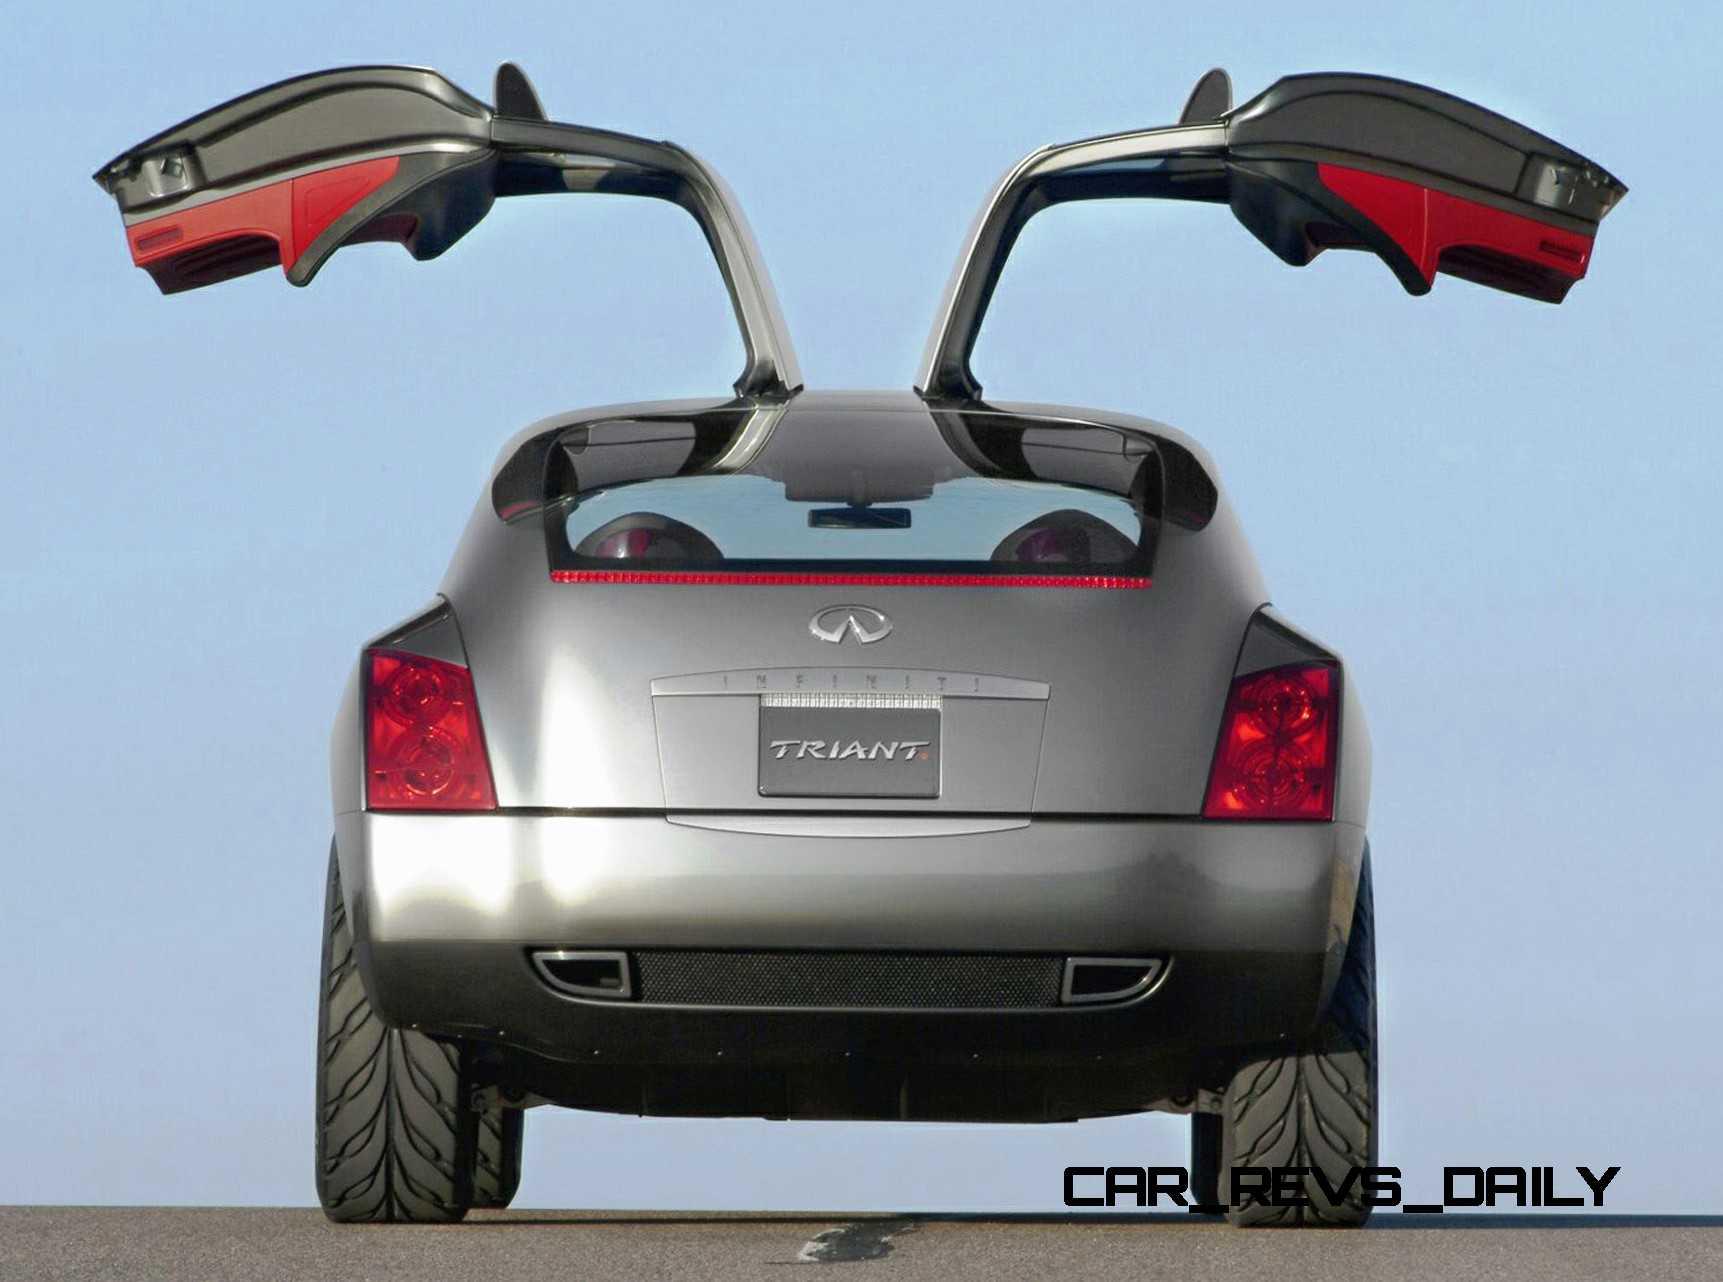 Design evolution series 2003 infiniti triant concept concept flashback 2003 infiniti triant 14 vanachro Images